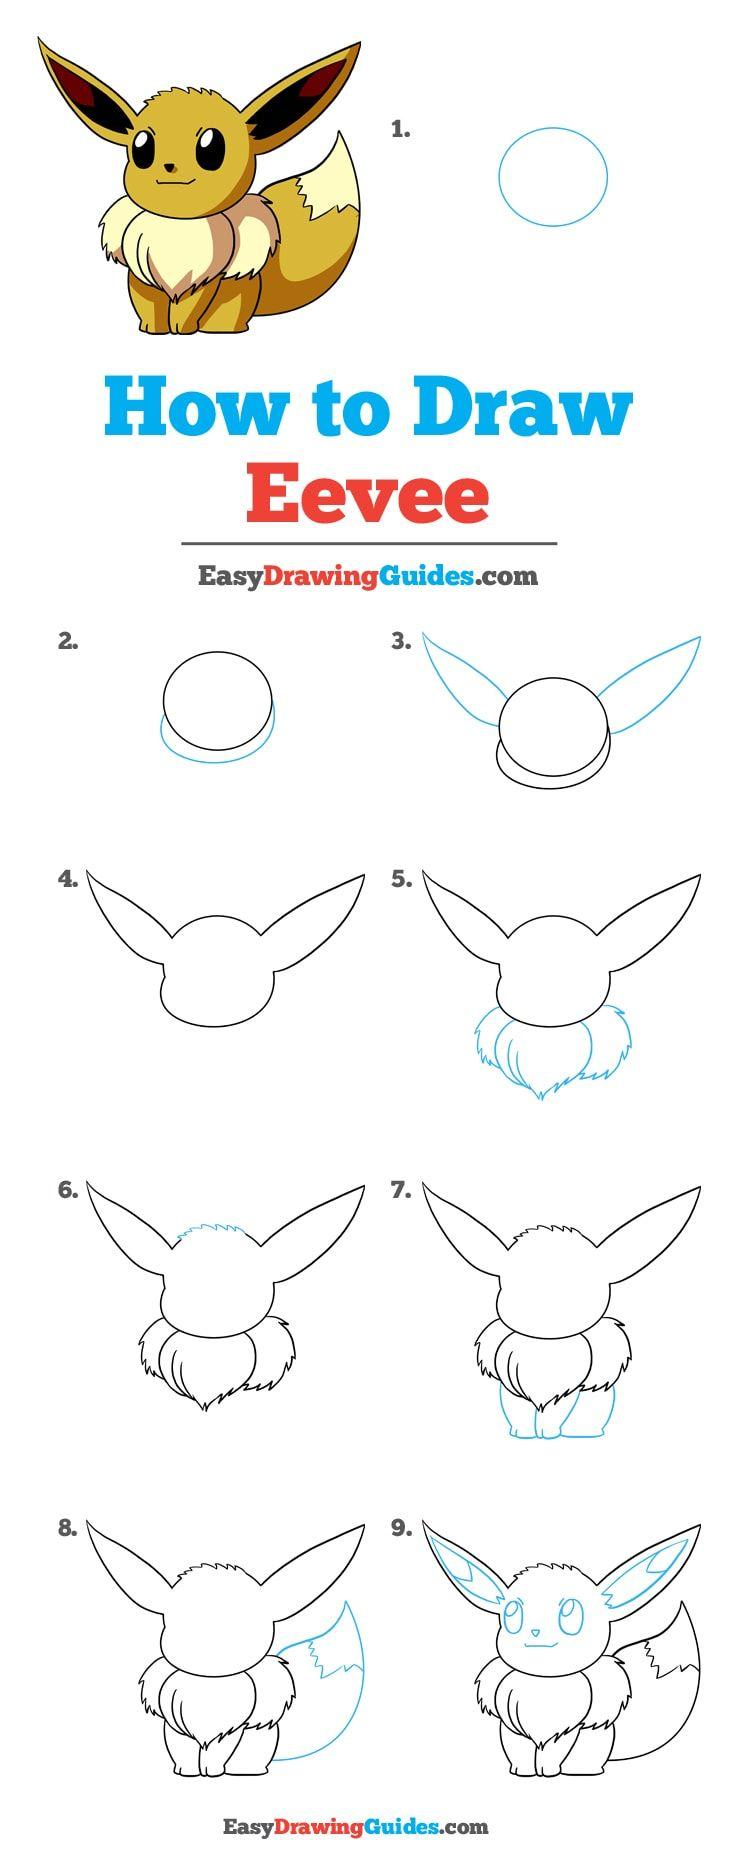 How to Draw Eevee from Pokémon